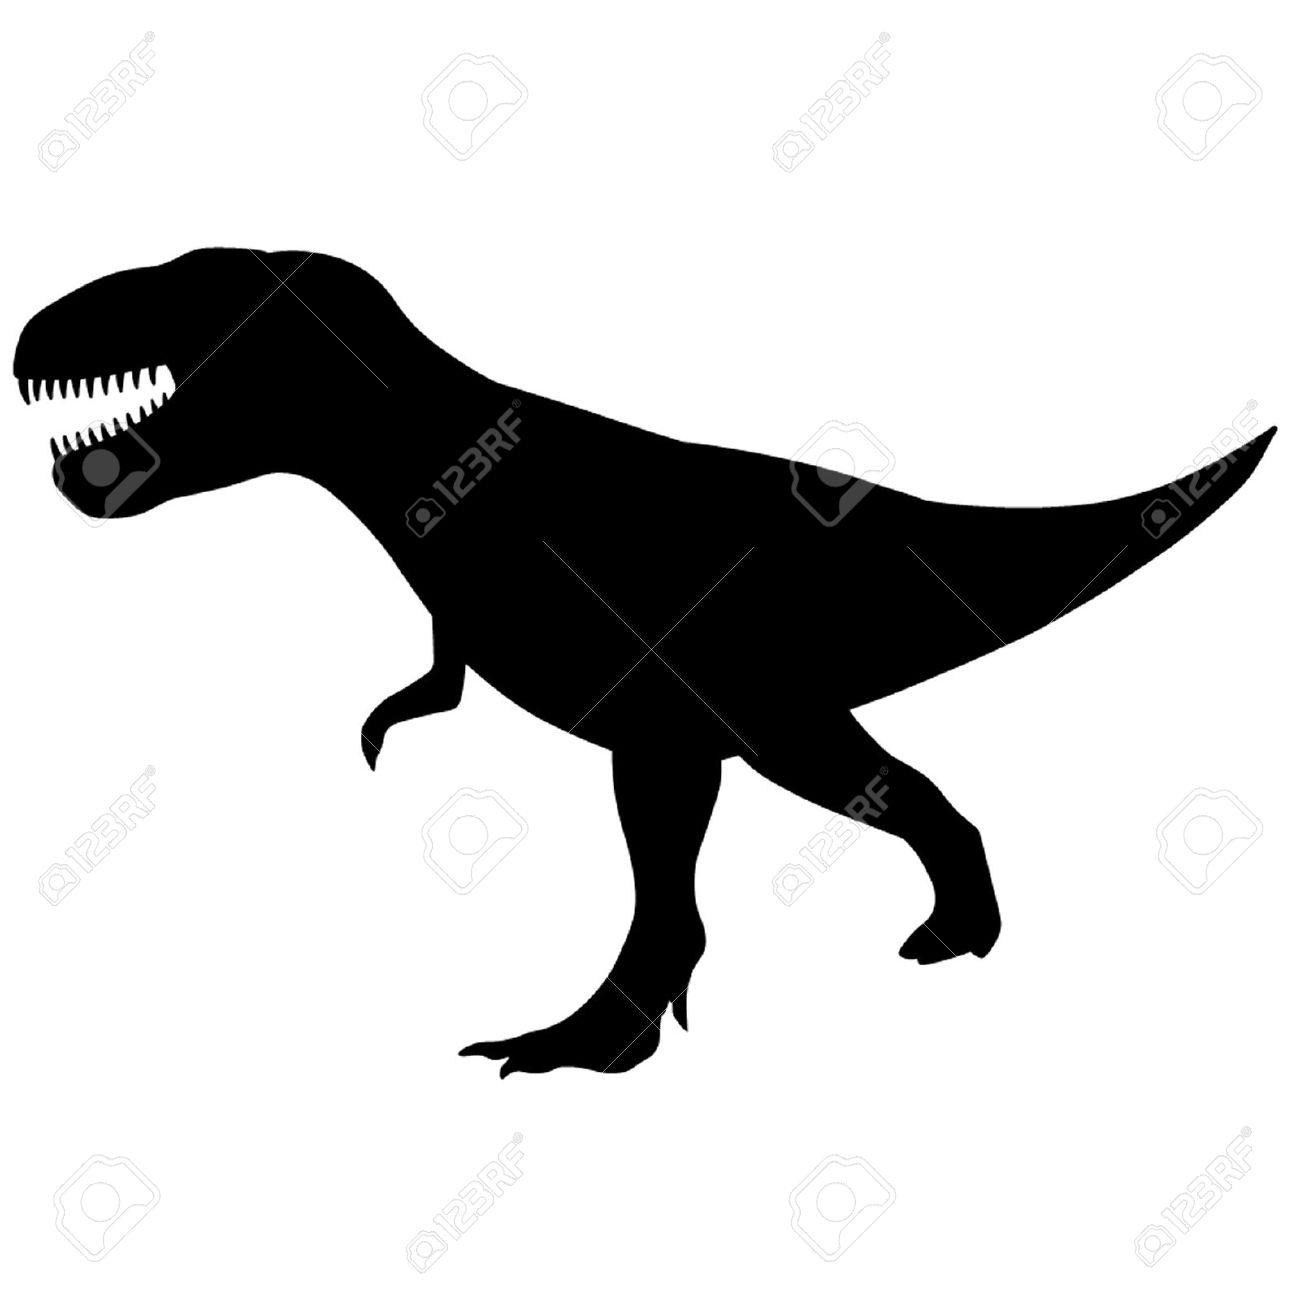 tyrannosaurus rex dinosaur royalty free cliparts vectors and stock rh 123rf com t rex vector icon t rex vector free download